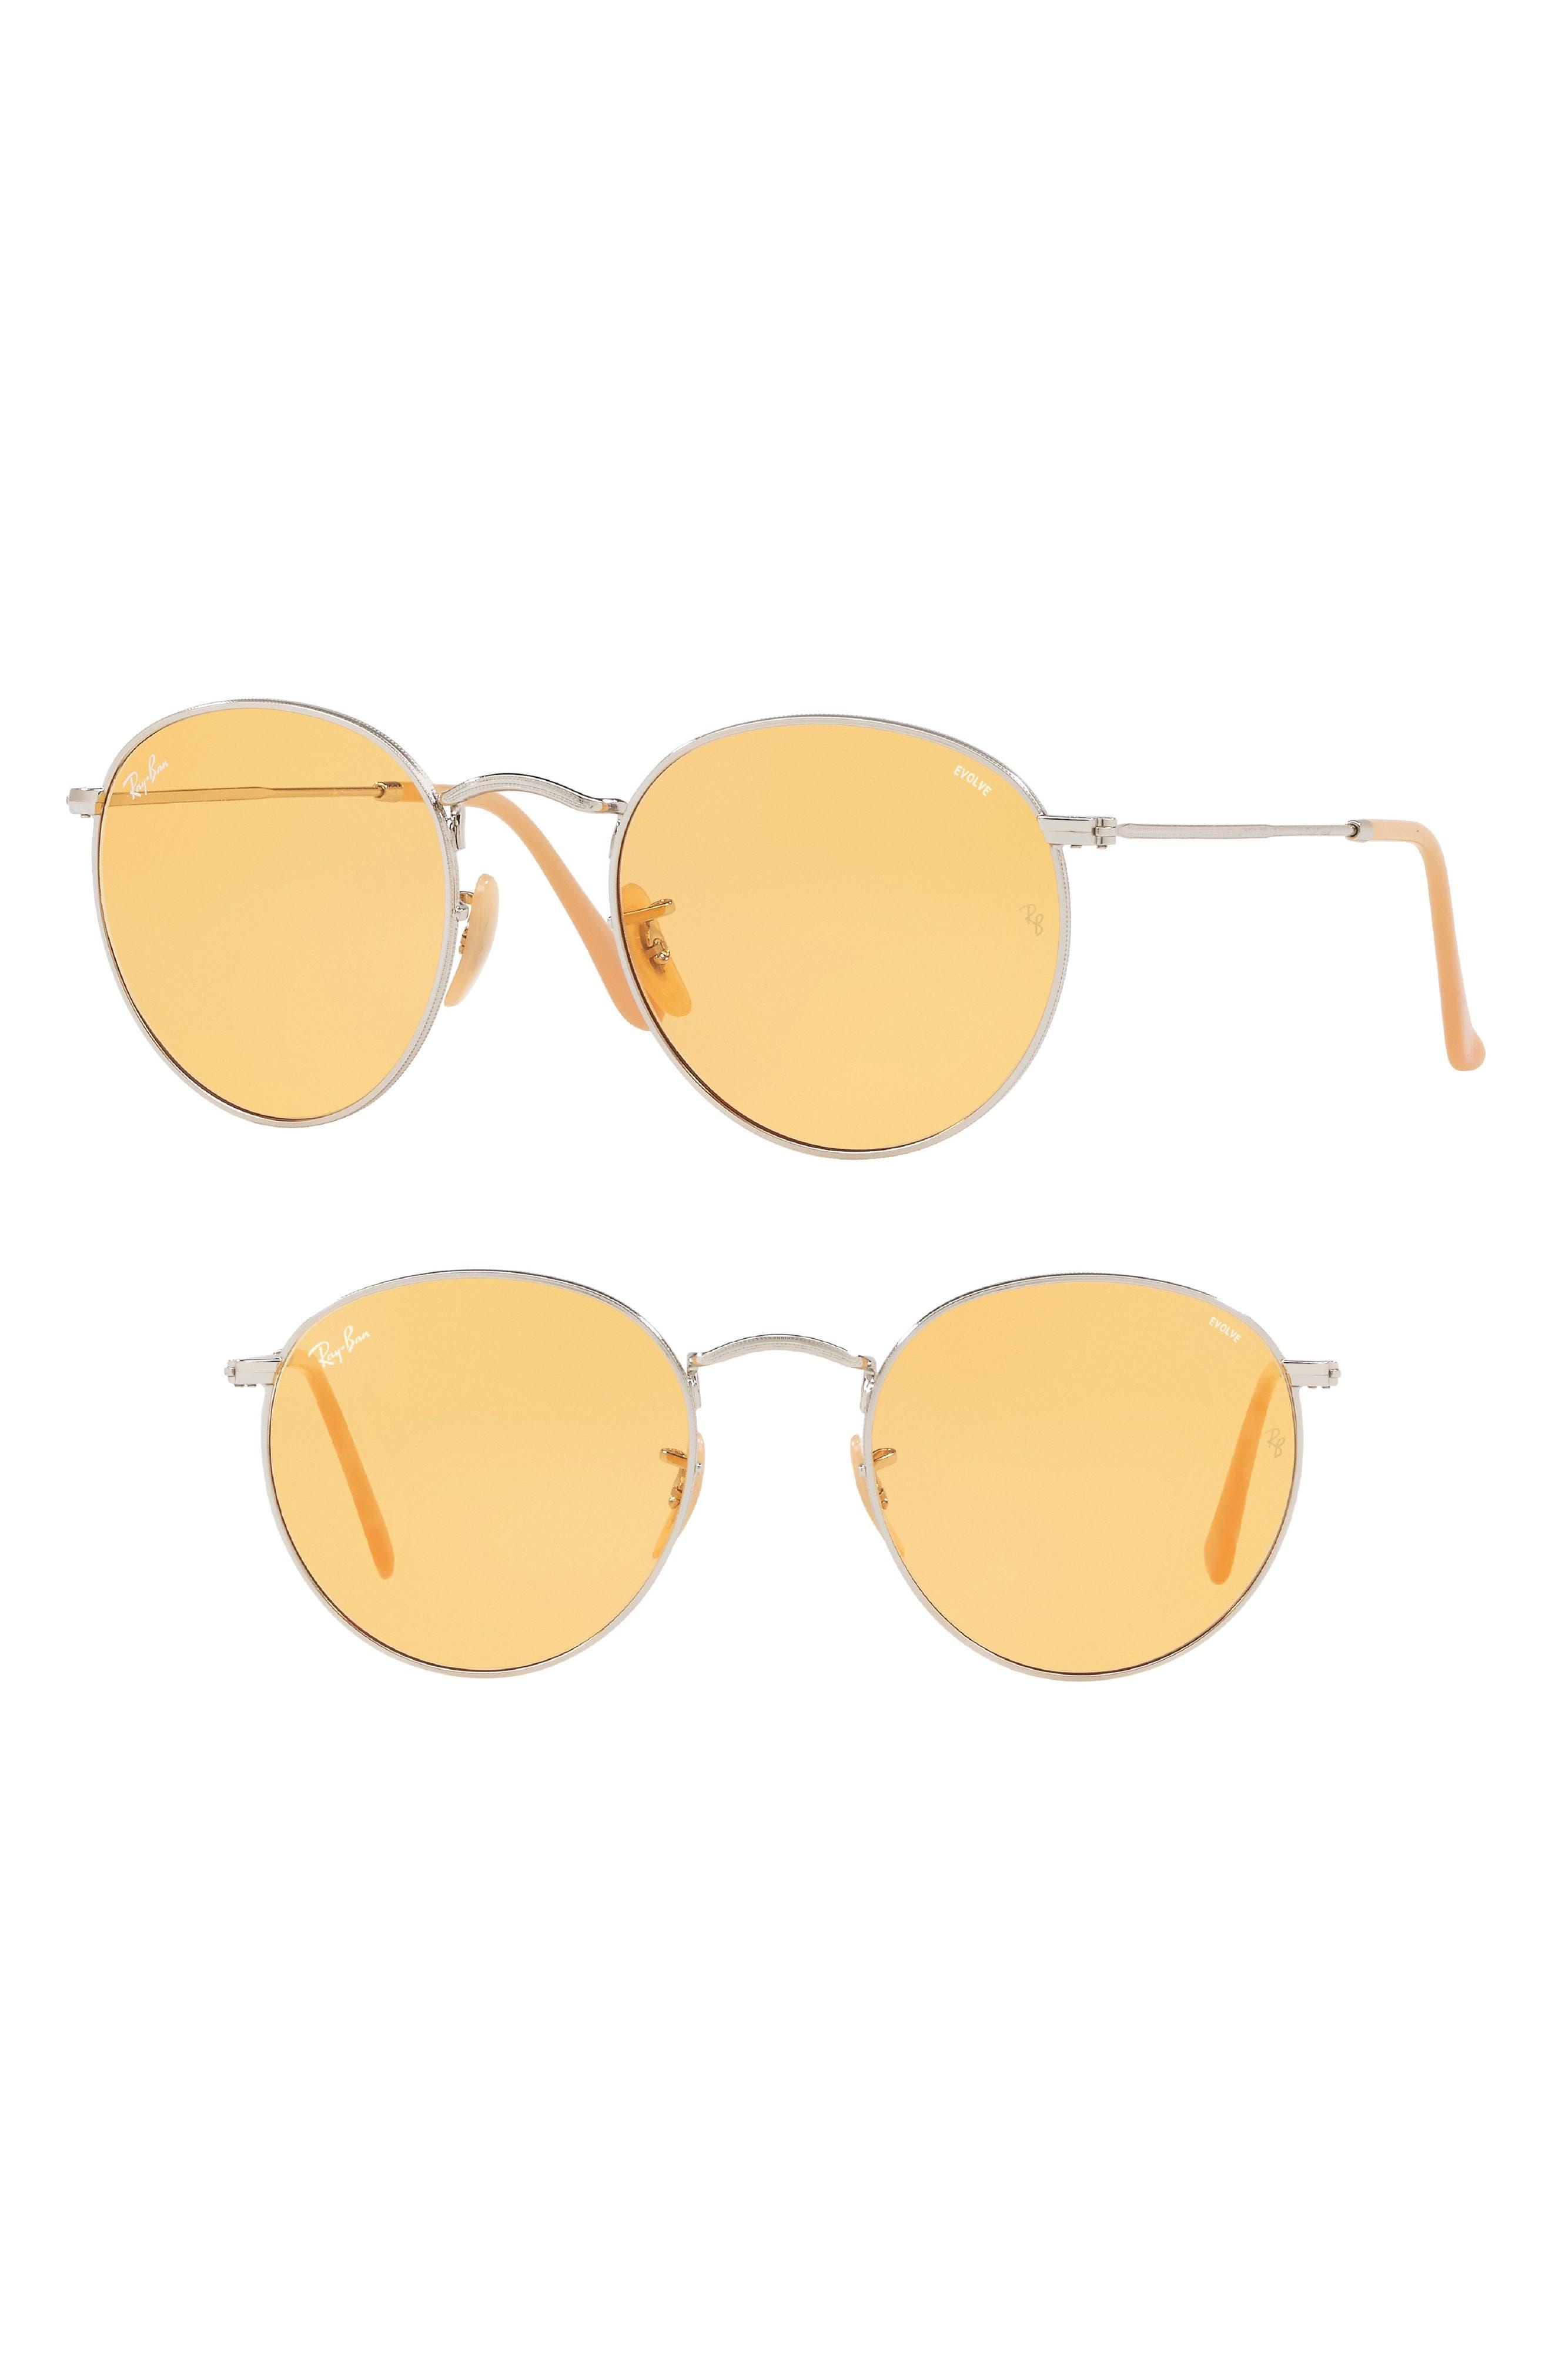 1960s Sunglasses | 70s Sunglasses, 70s Glasses Ray-Ban 53mm Evolve Photochromic Round Sunglasses Size One Size - Orange at Nordstrom Rack $128.97 AT vintagedancer.com